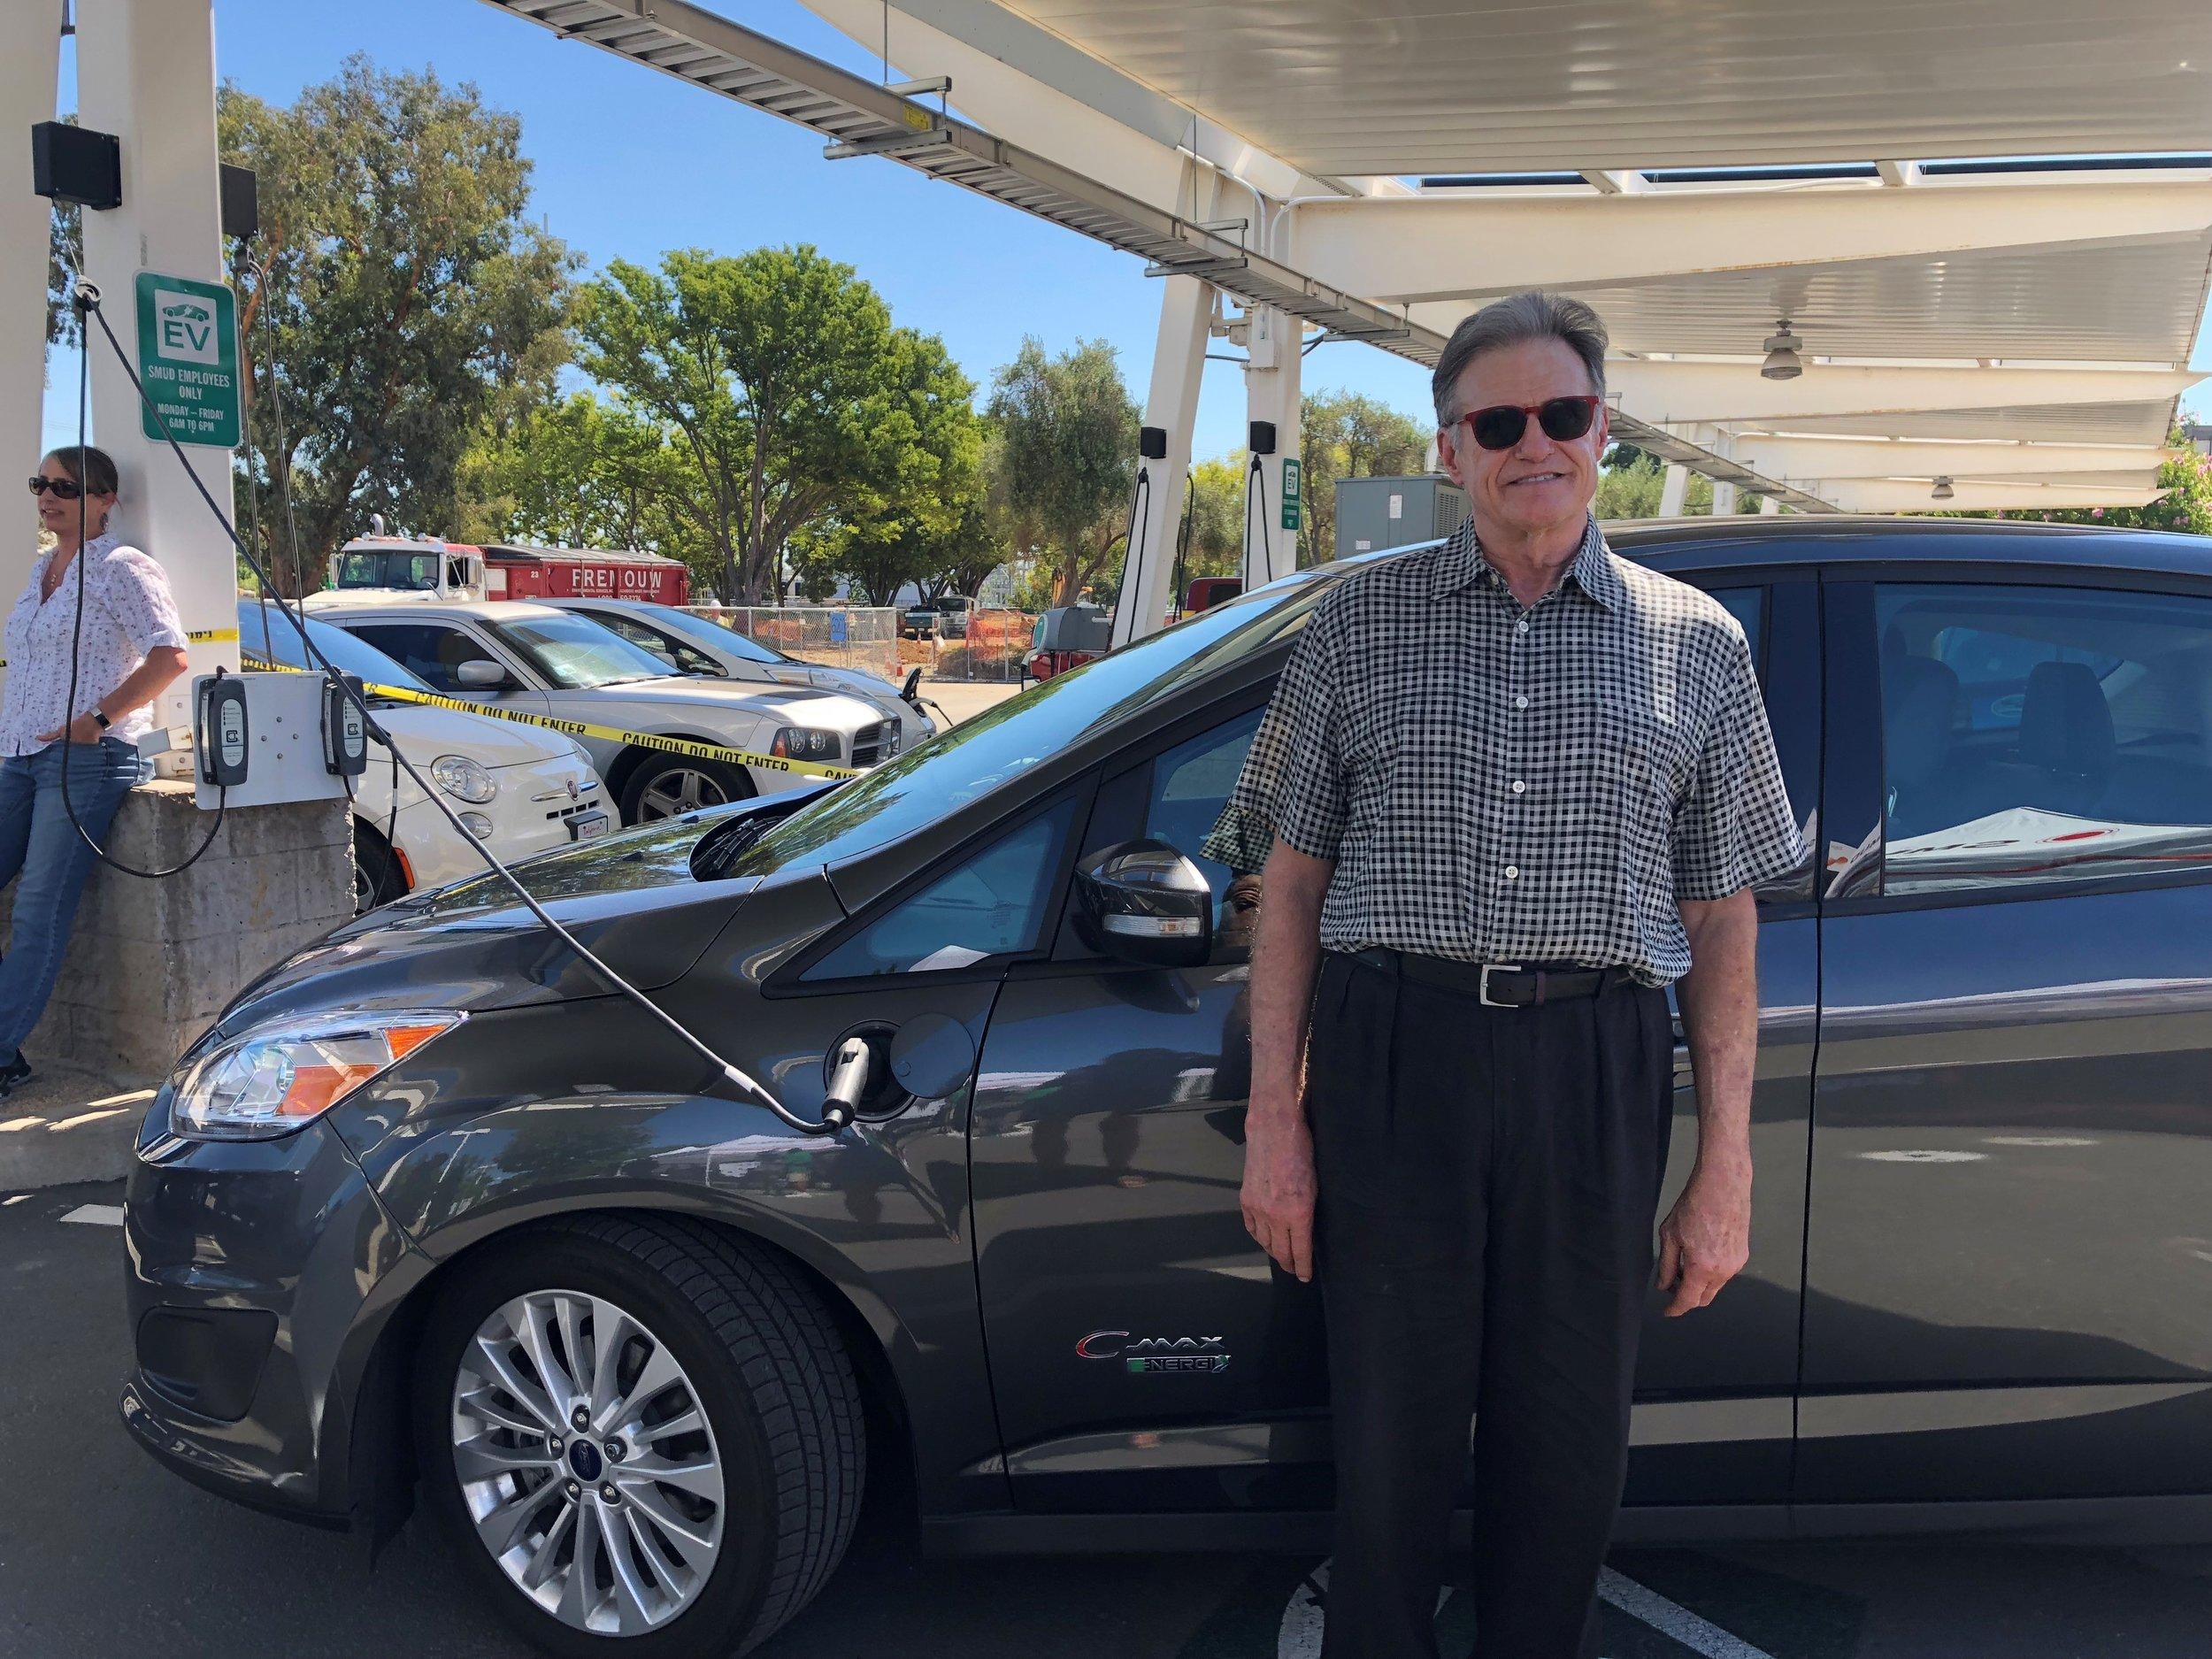 Uber, SMUD paying Sacramento Uber drivers to use electric